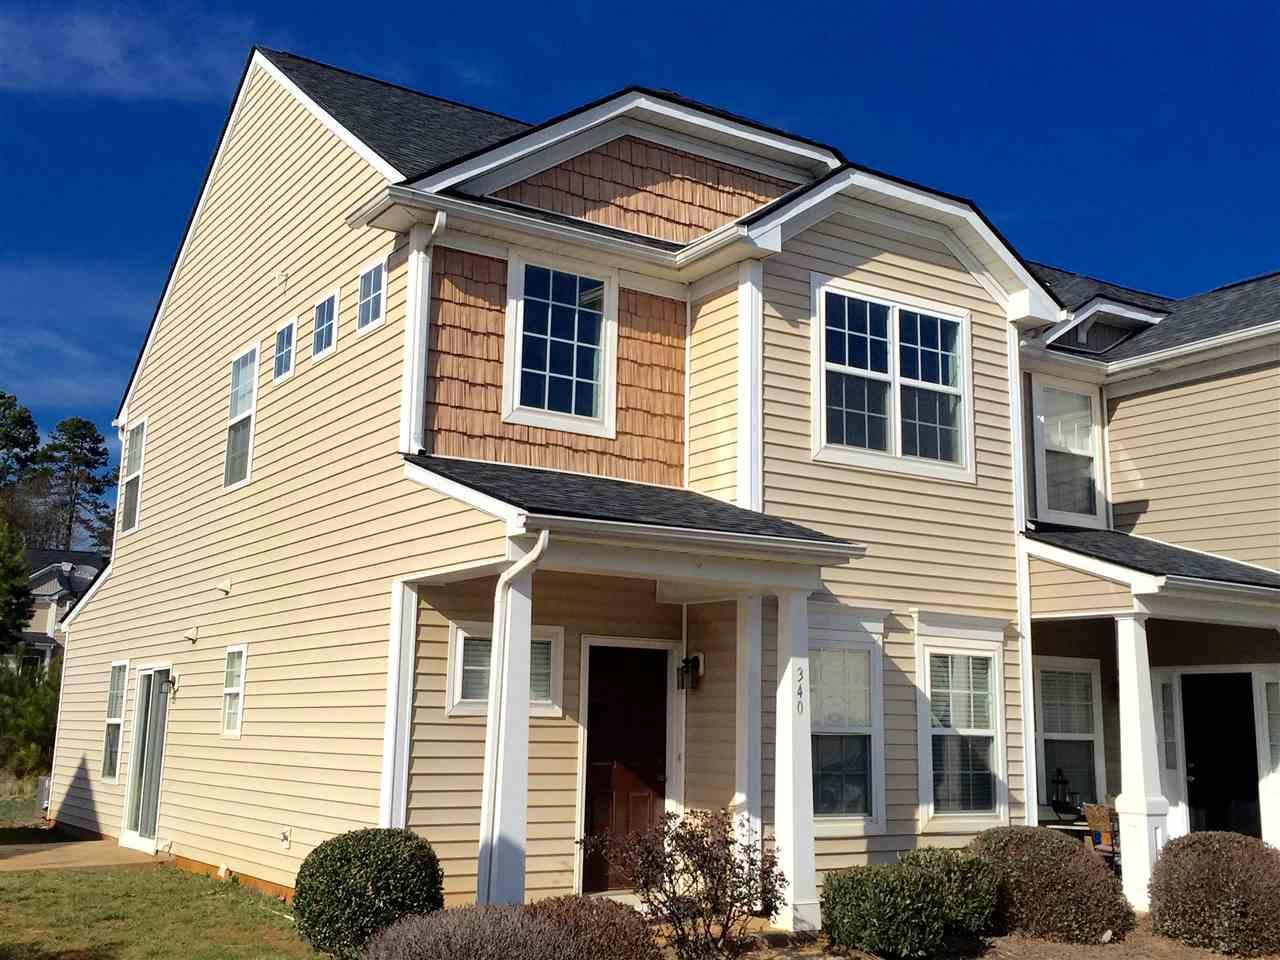 Single Family Home for Sale, ListingId:37003393, location: 340 Hancock Union Ln. Rock Hill 29732